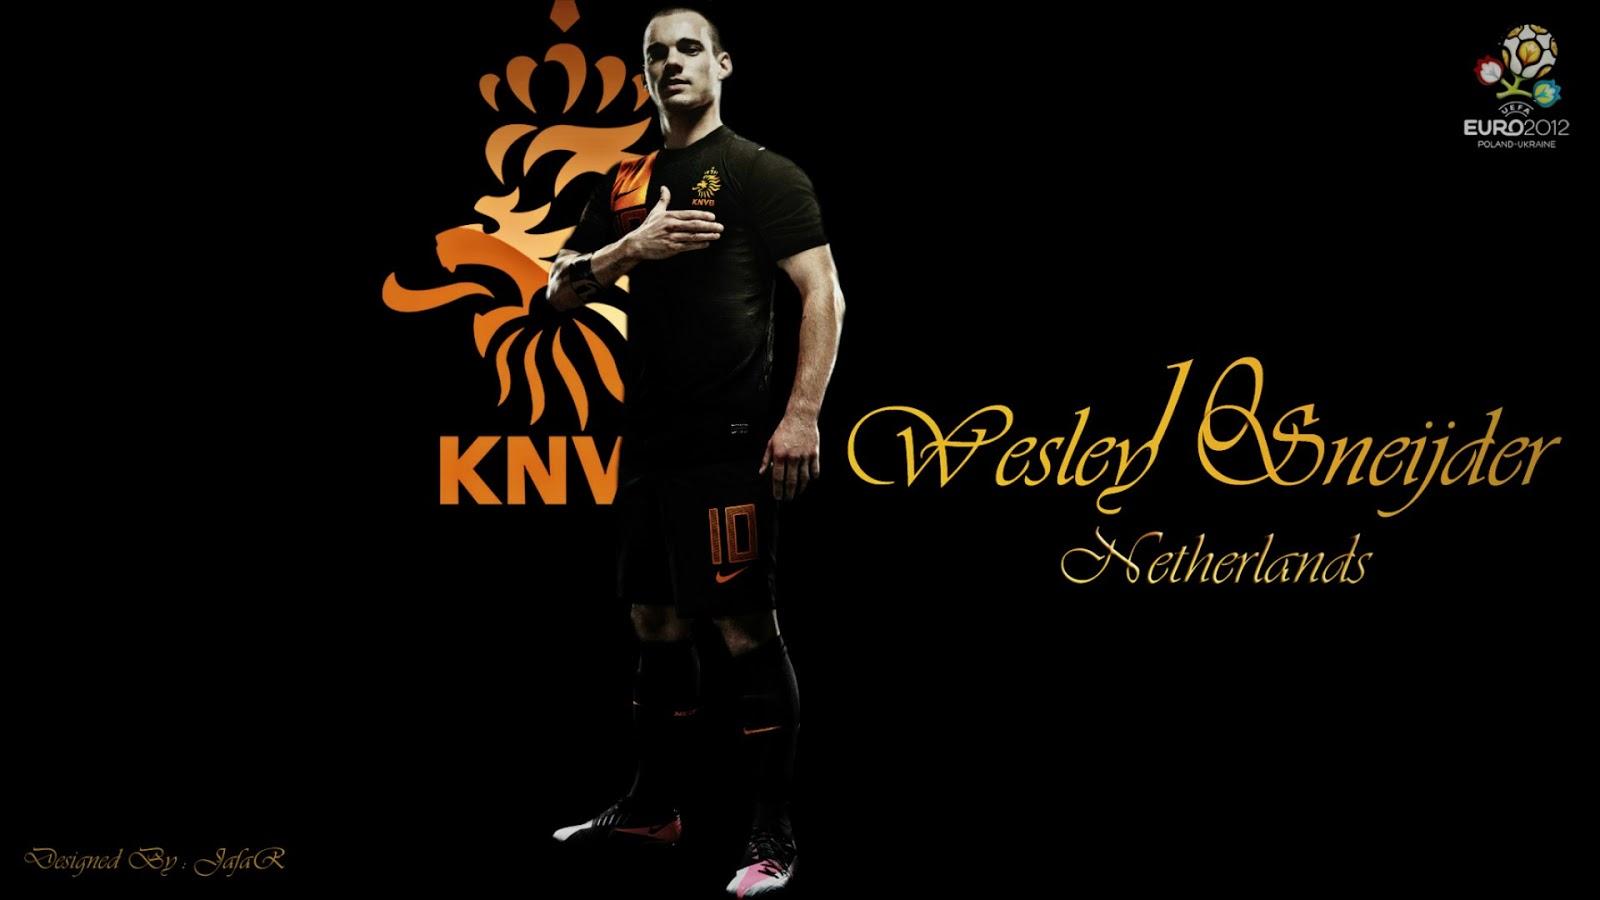 wesley+sneijder+galatasaray+resimleri+rooteto+13 Wesley Sneijder Galatasaray HD Resimleri